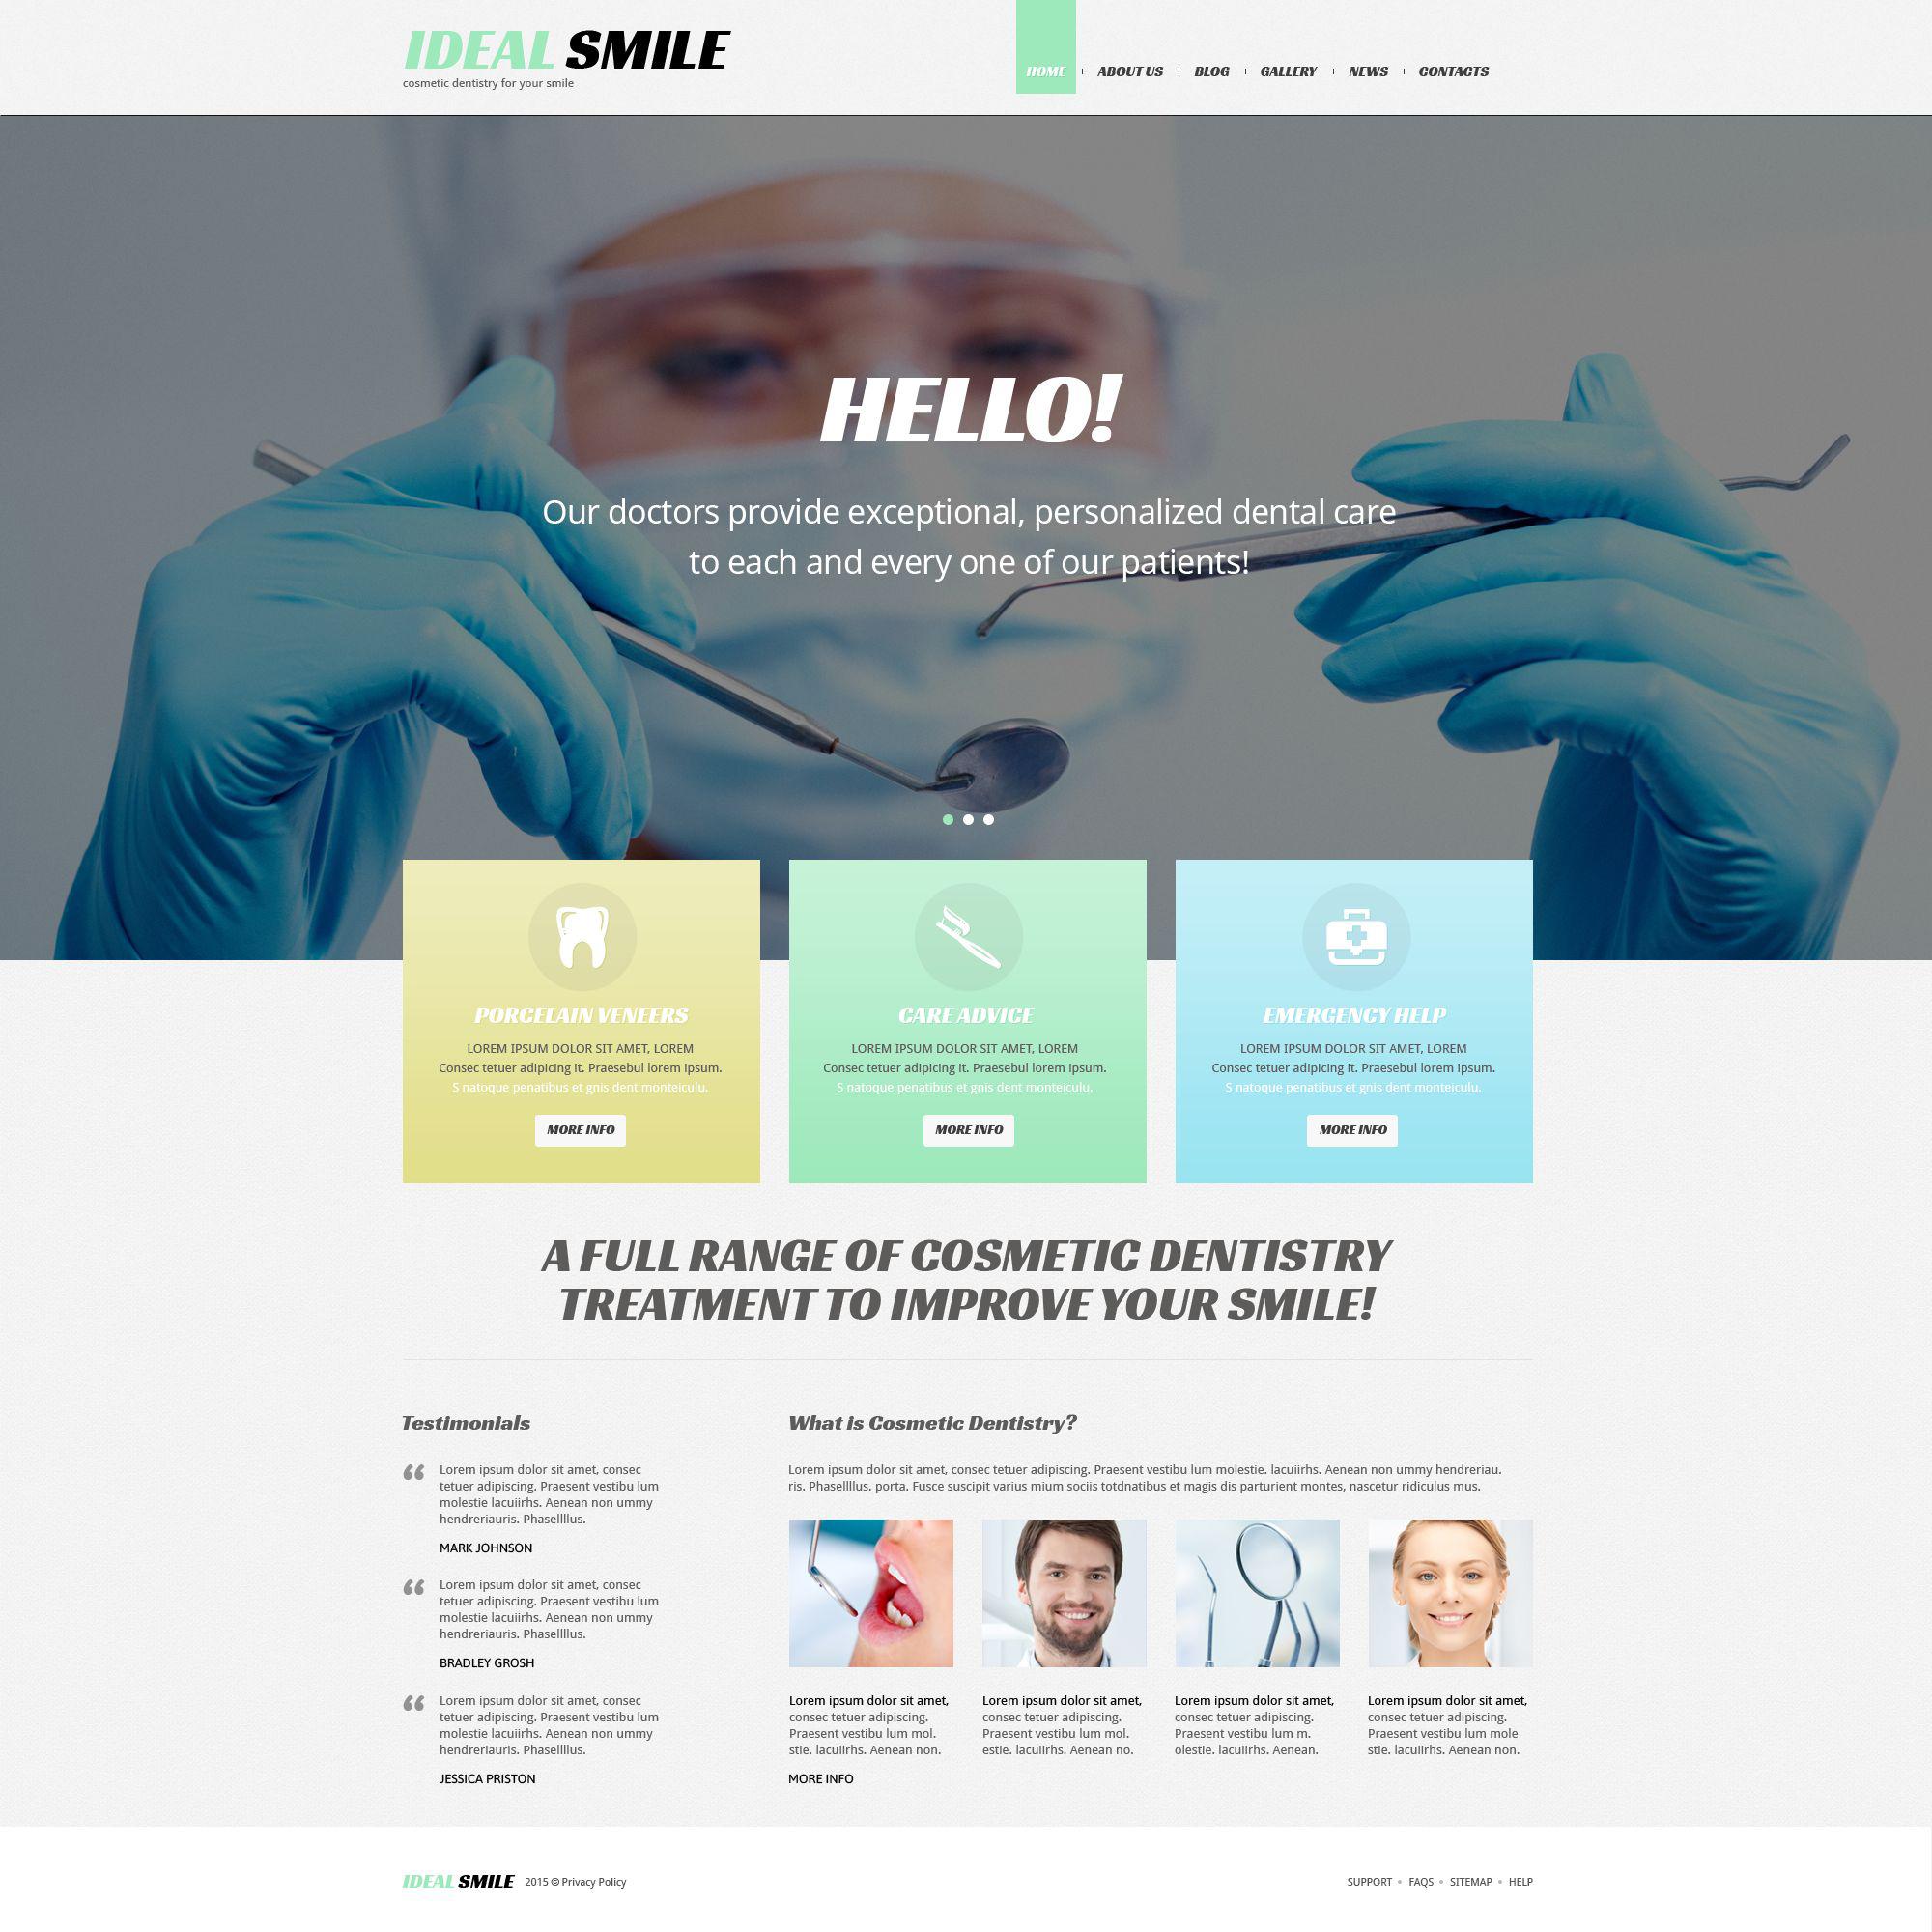 Thème WordPress adaptatif pour site de dentisterie #54036 - screenshot